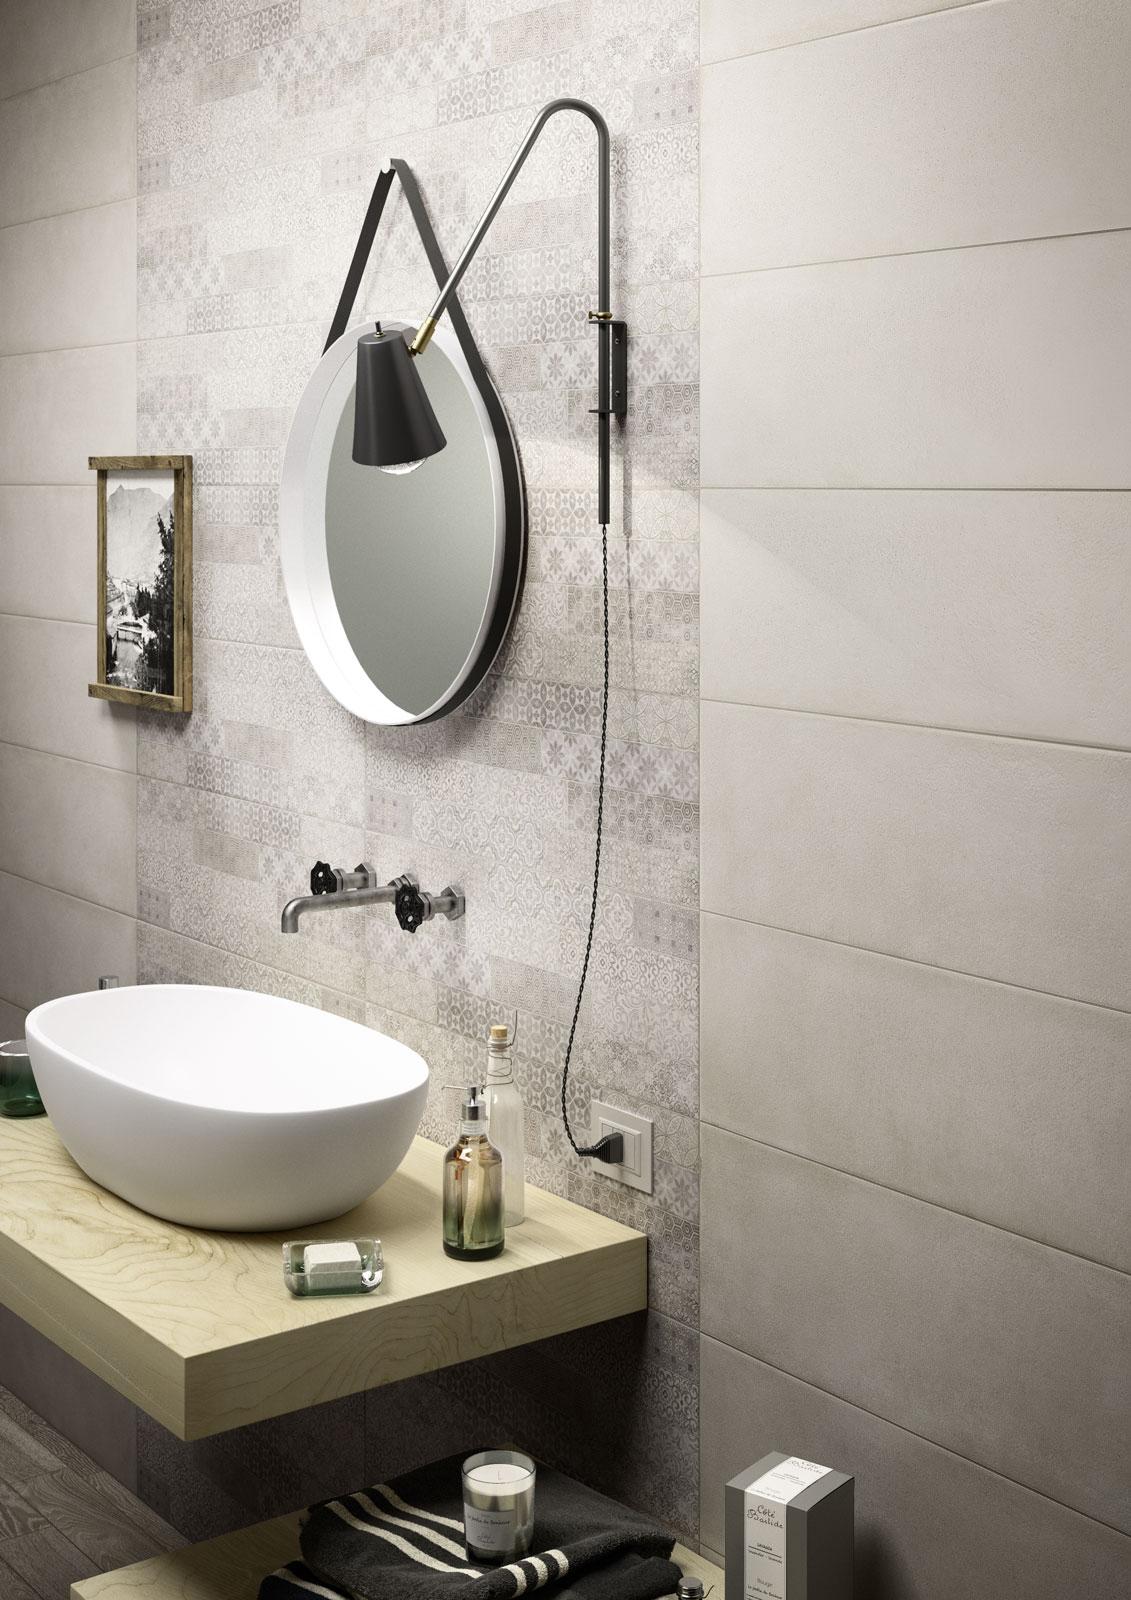 wandfliesen k che bad dusche marazzi. Black Bedroom Furniture Sets. Home Design Ideas